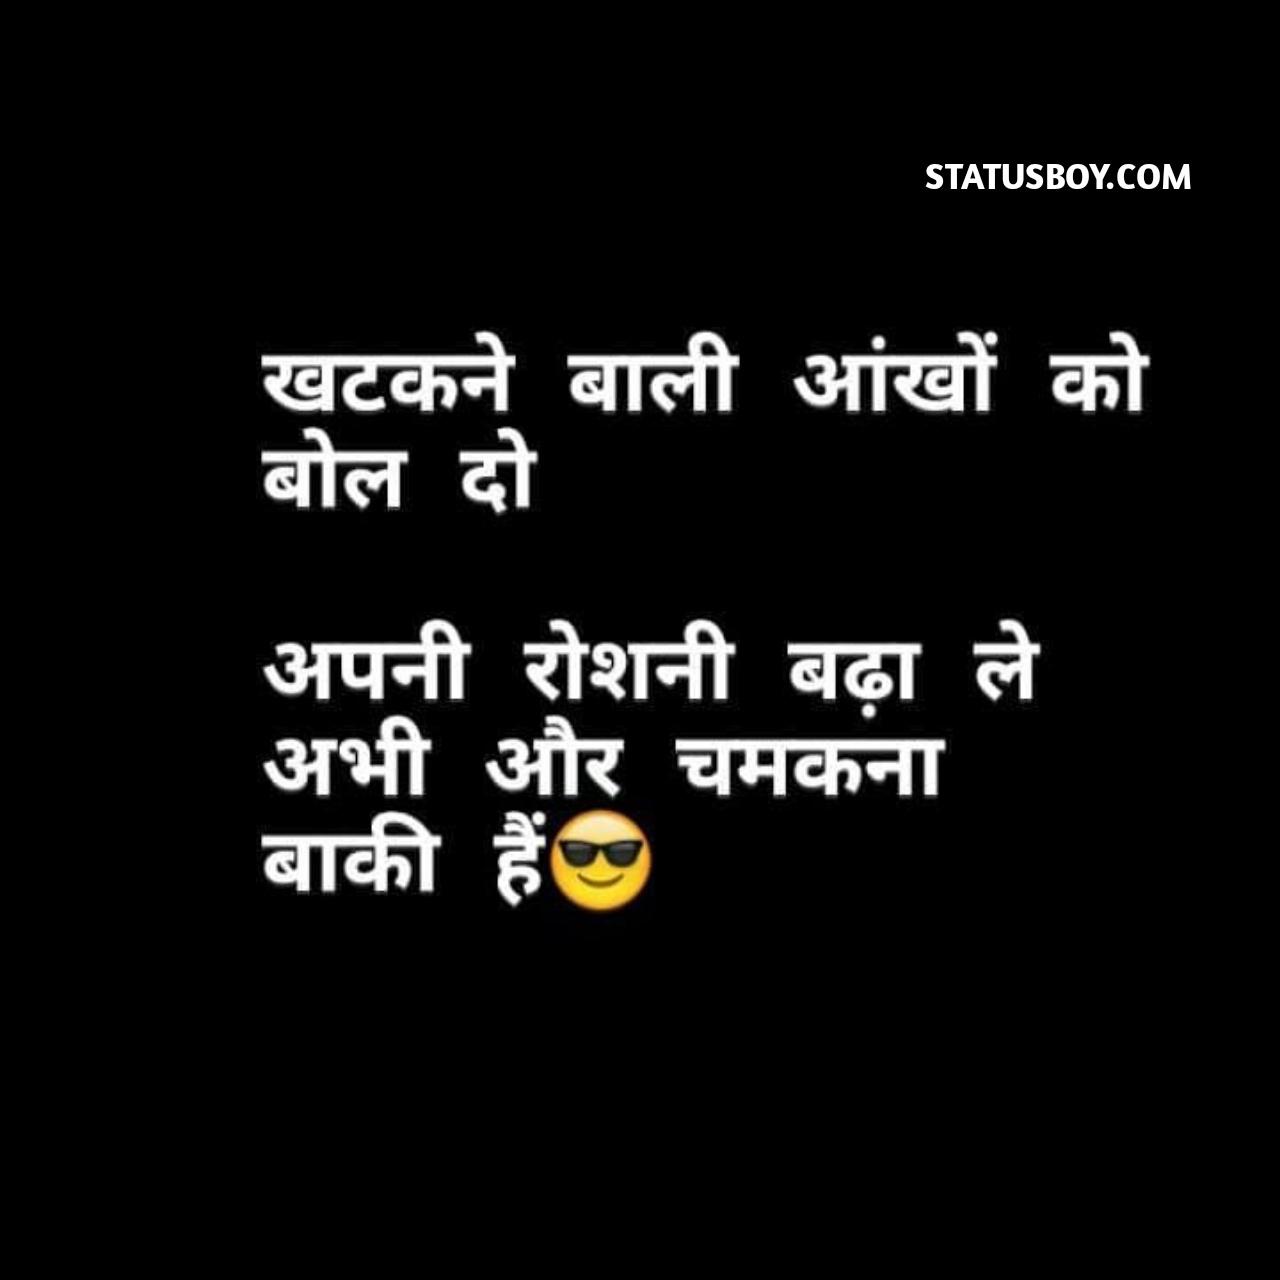 Hindi Suvichar 2020